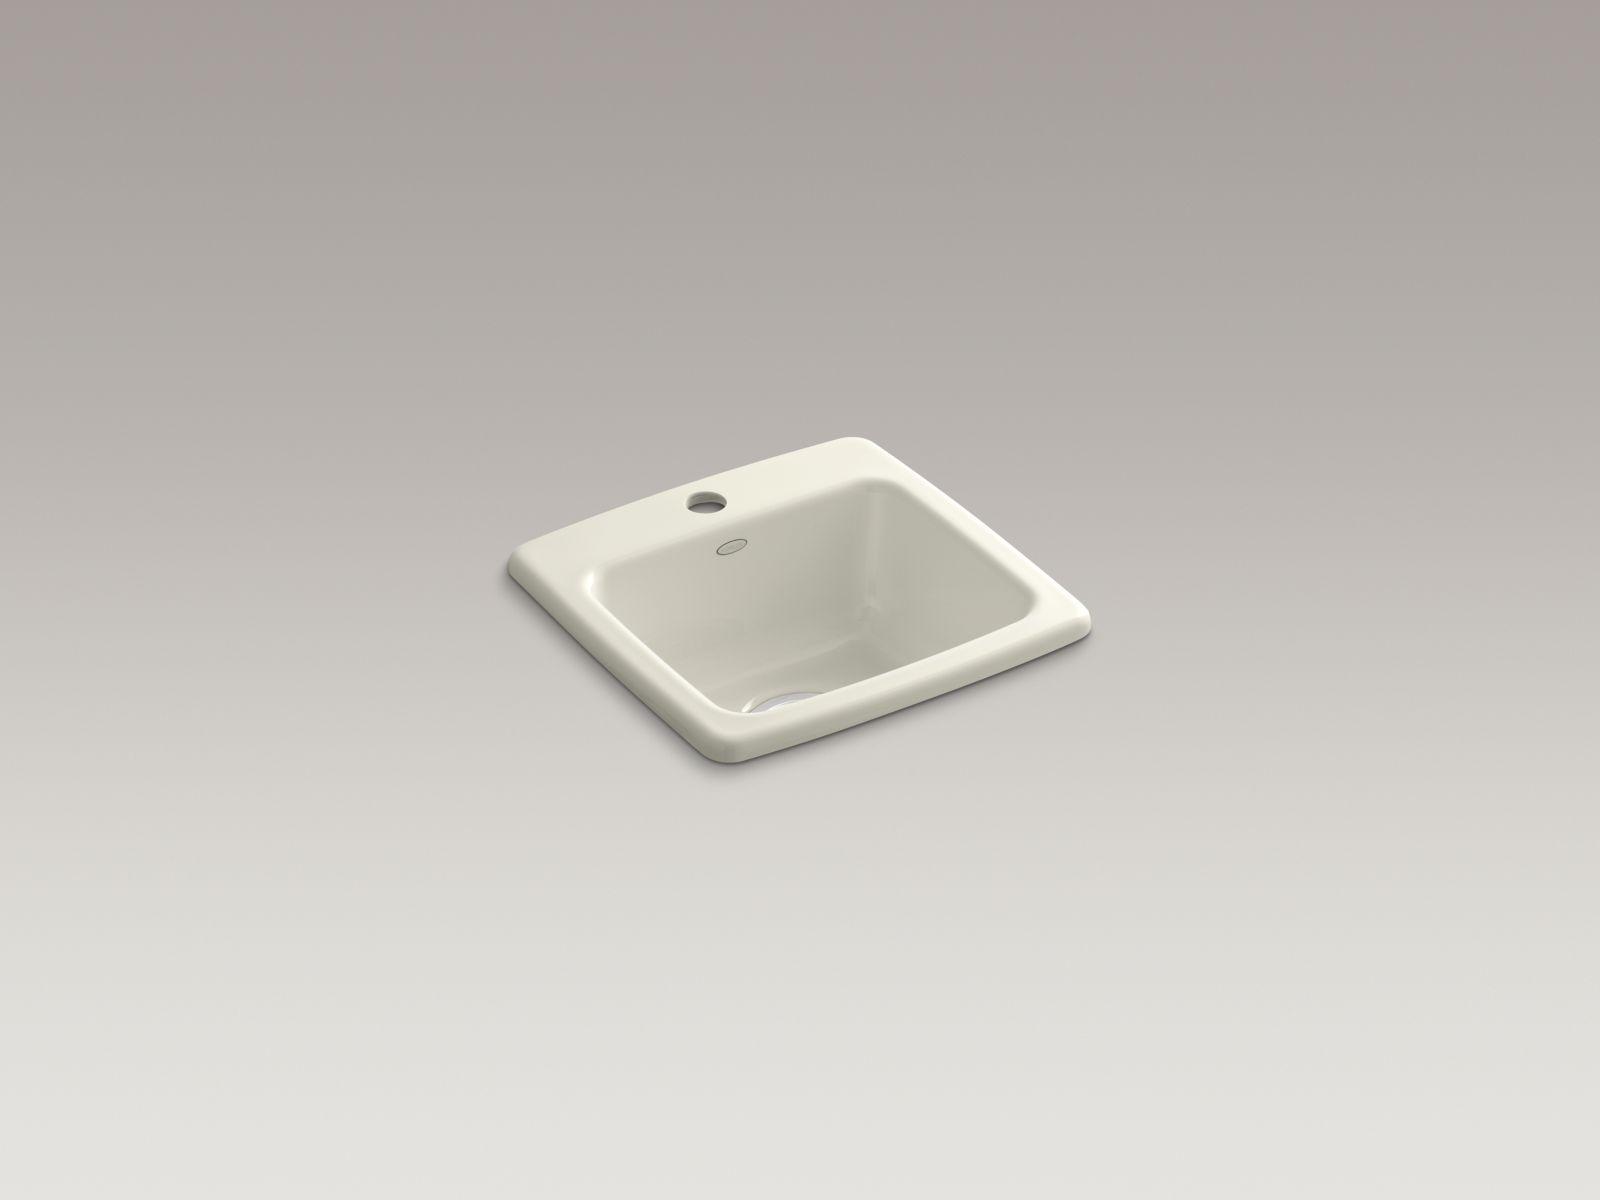 Kohler K-6015-1-96 Gimlet Self-rimming Single-bowl Bar Sink with Single Faucet Hole Biscuit